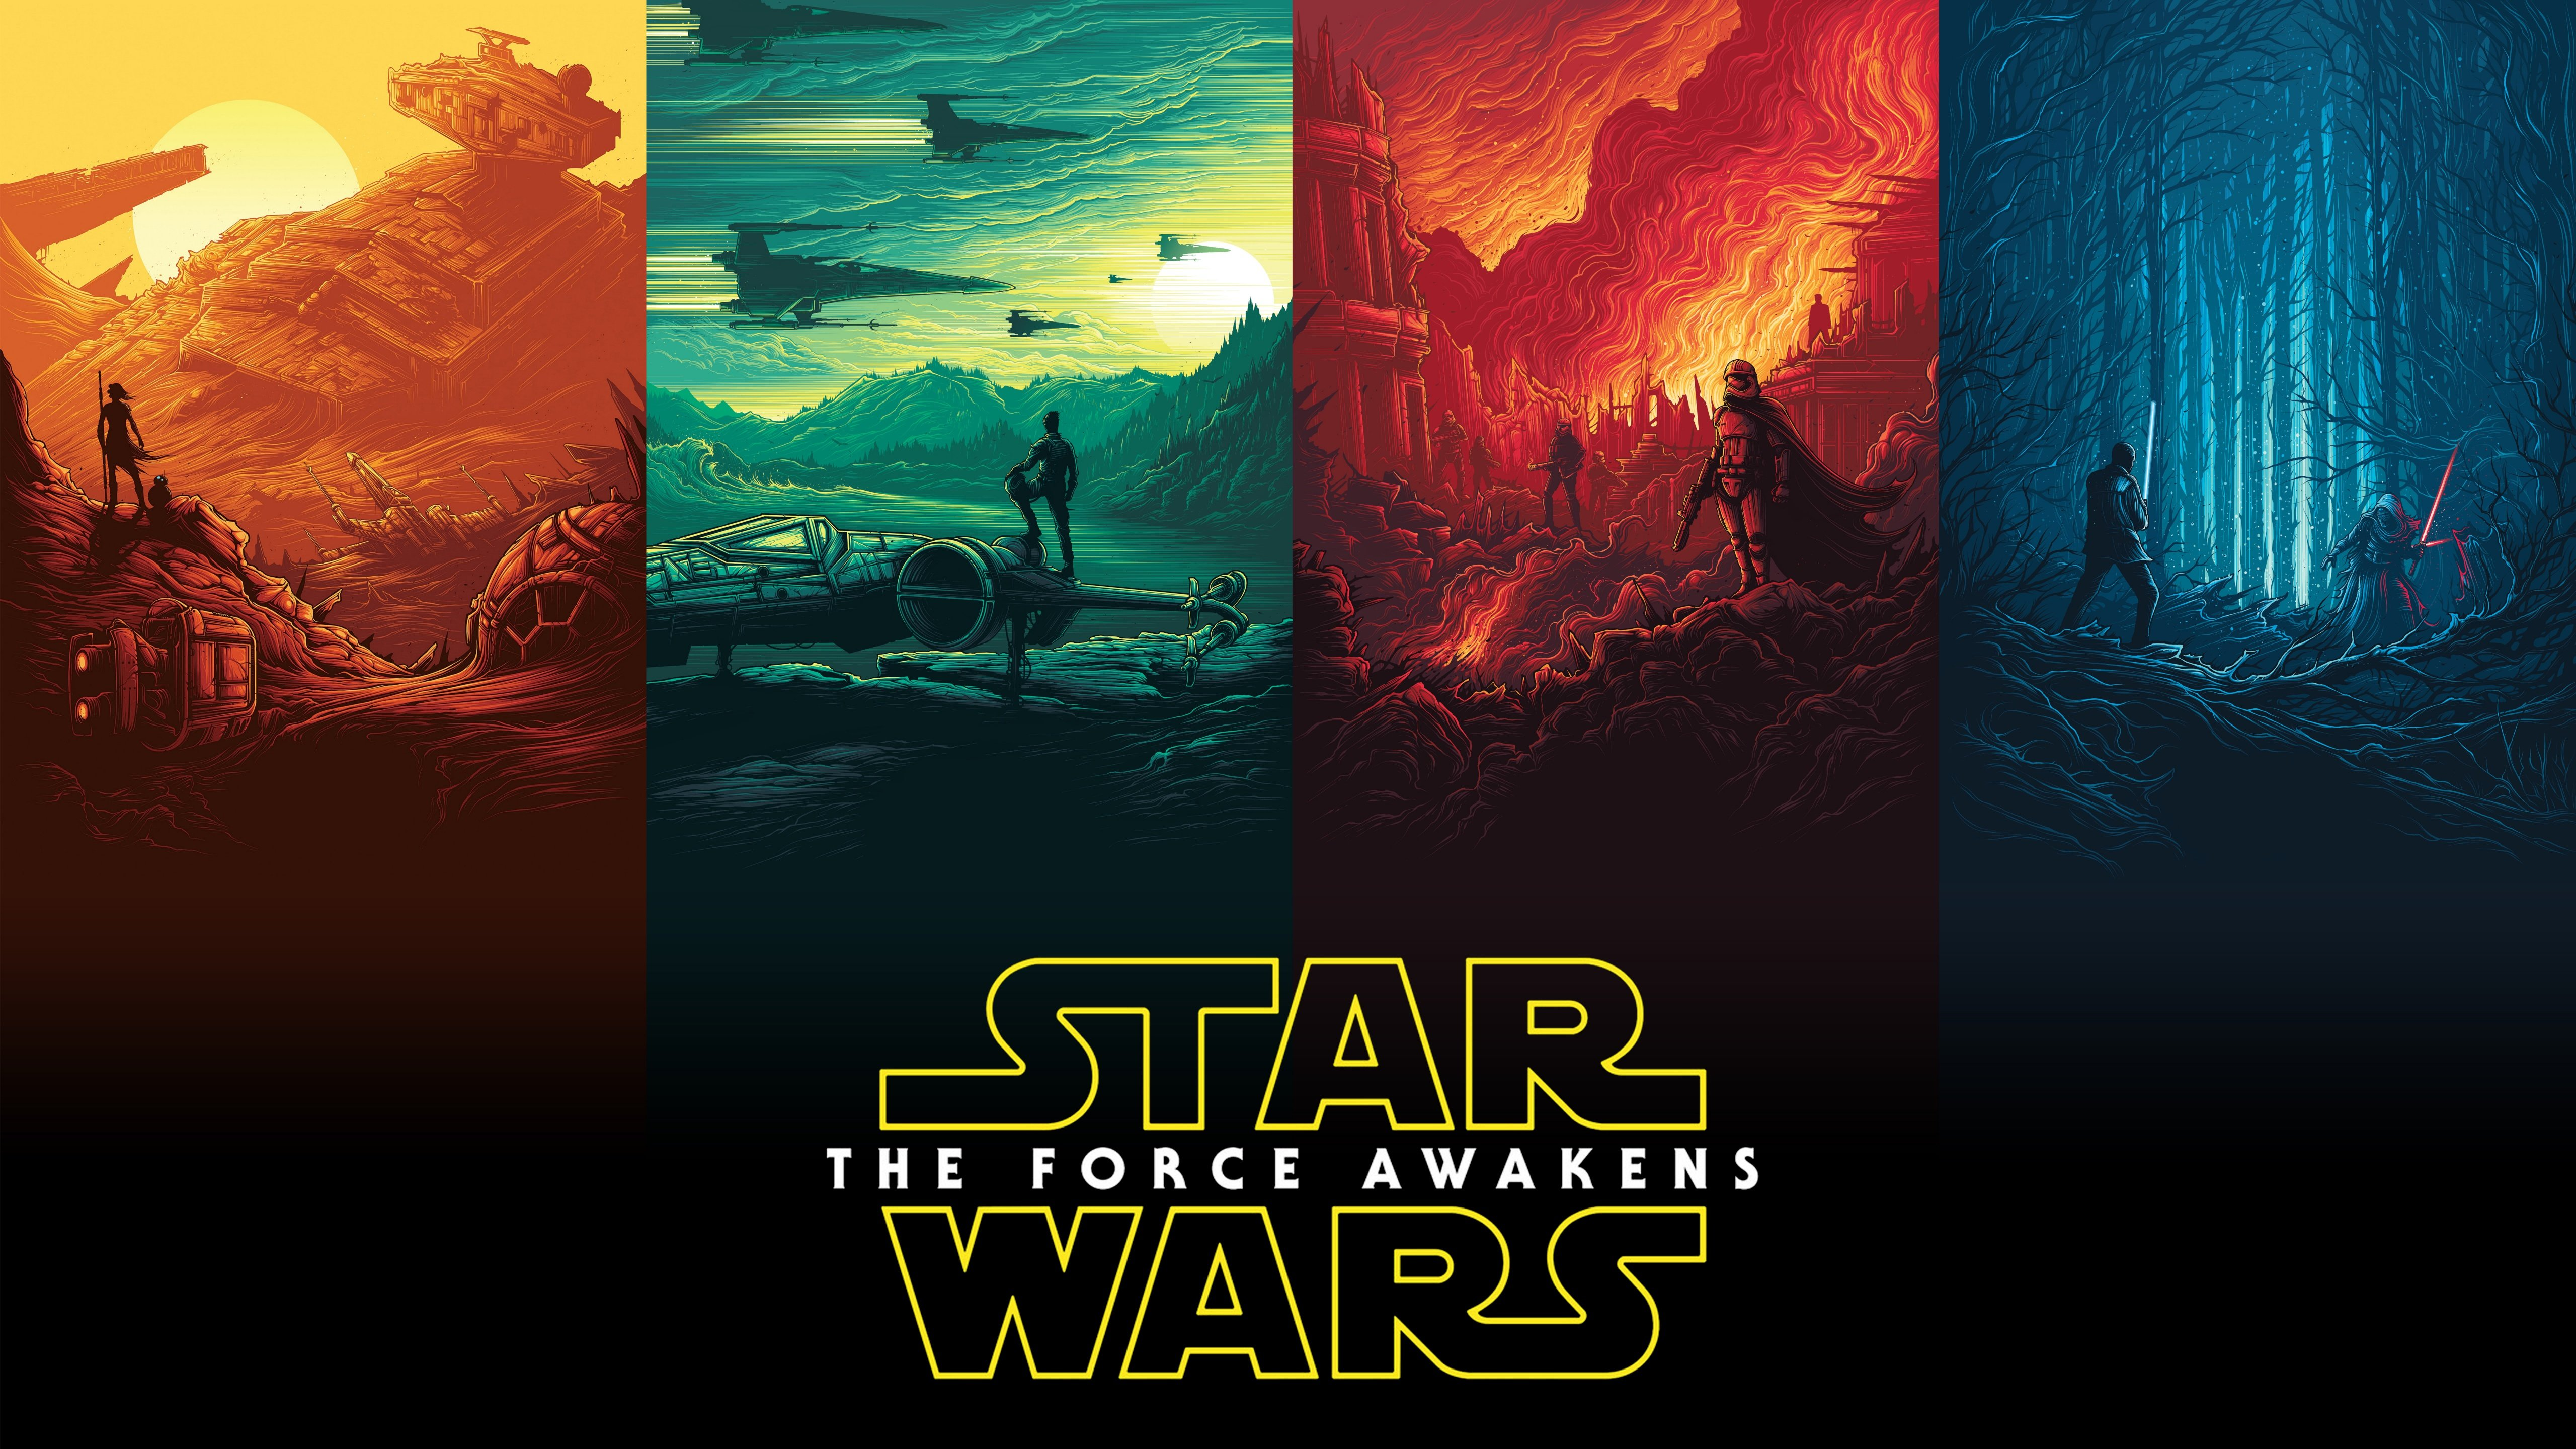 Star Wars Vector Wallpaper Posted By Sarah Walker